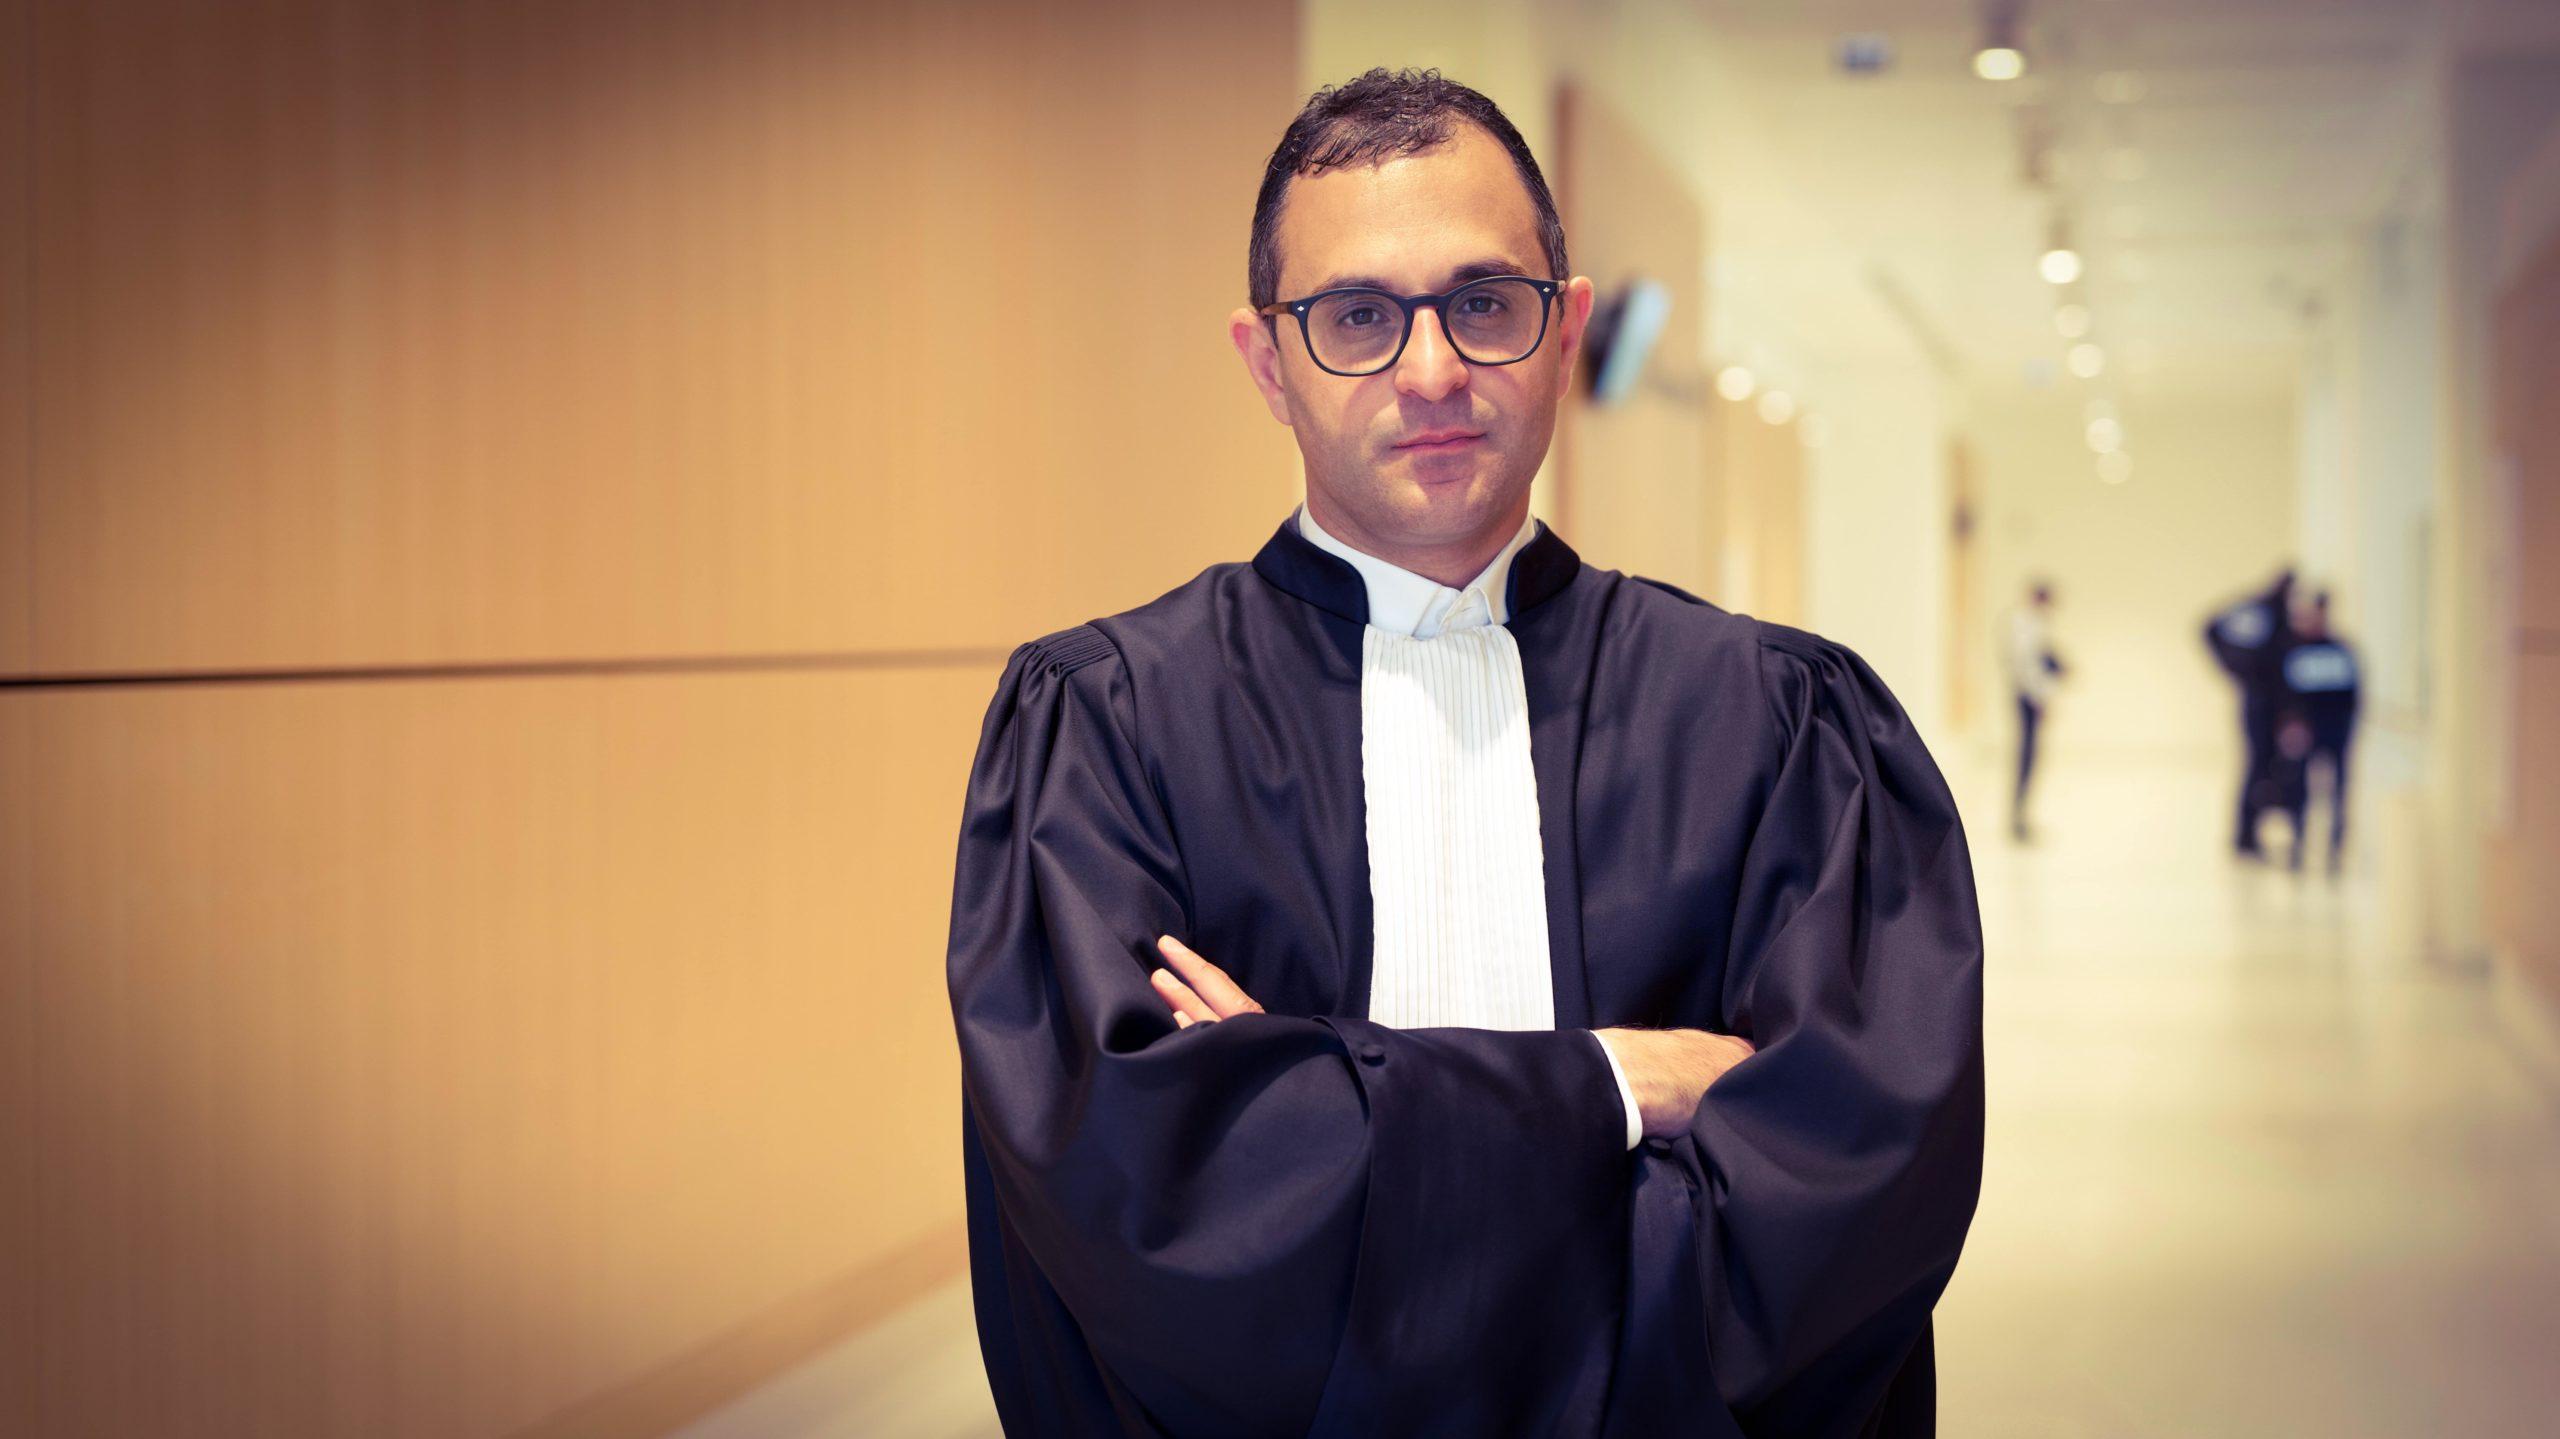 Portrait de l'avocat et élu Arash Derambarsh